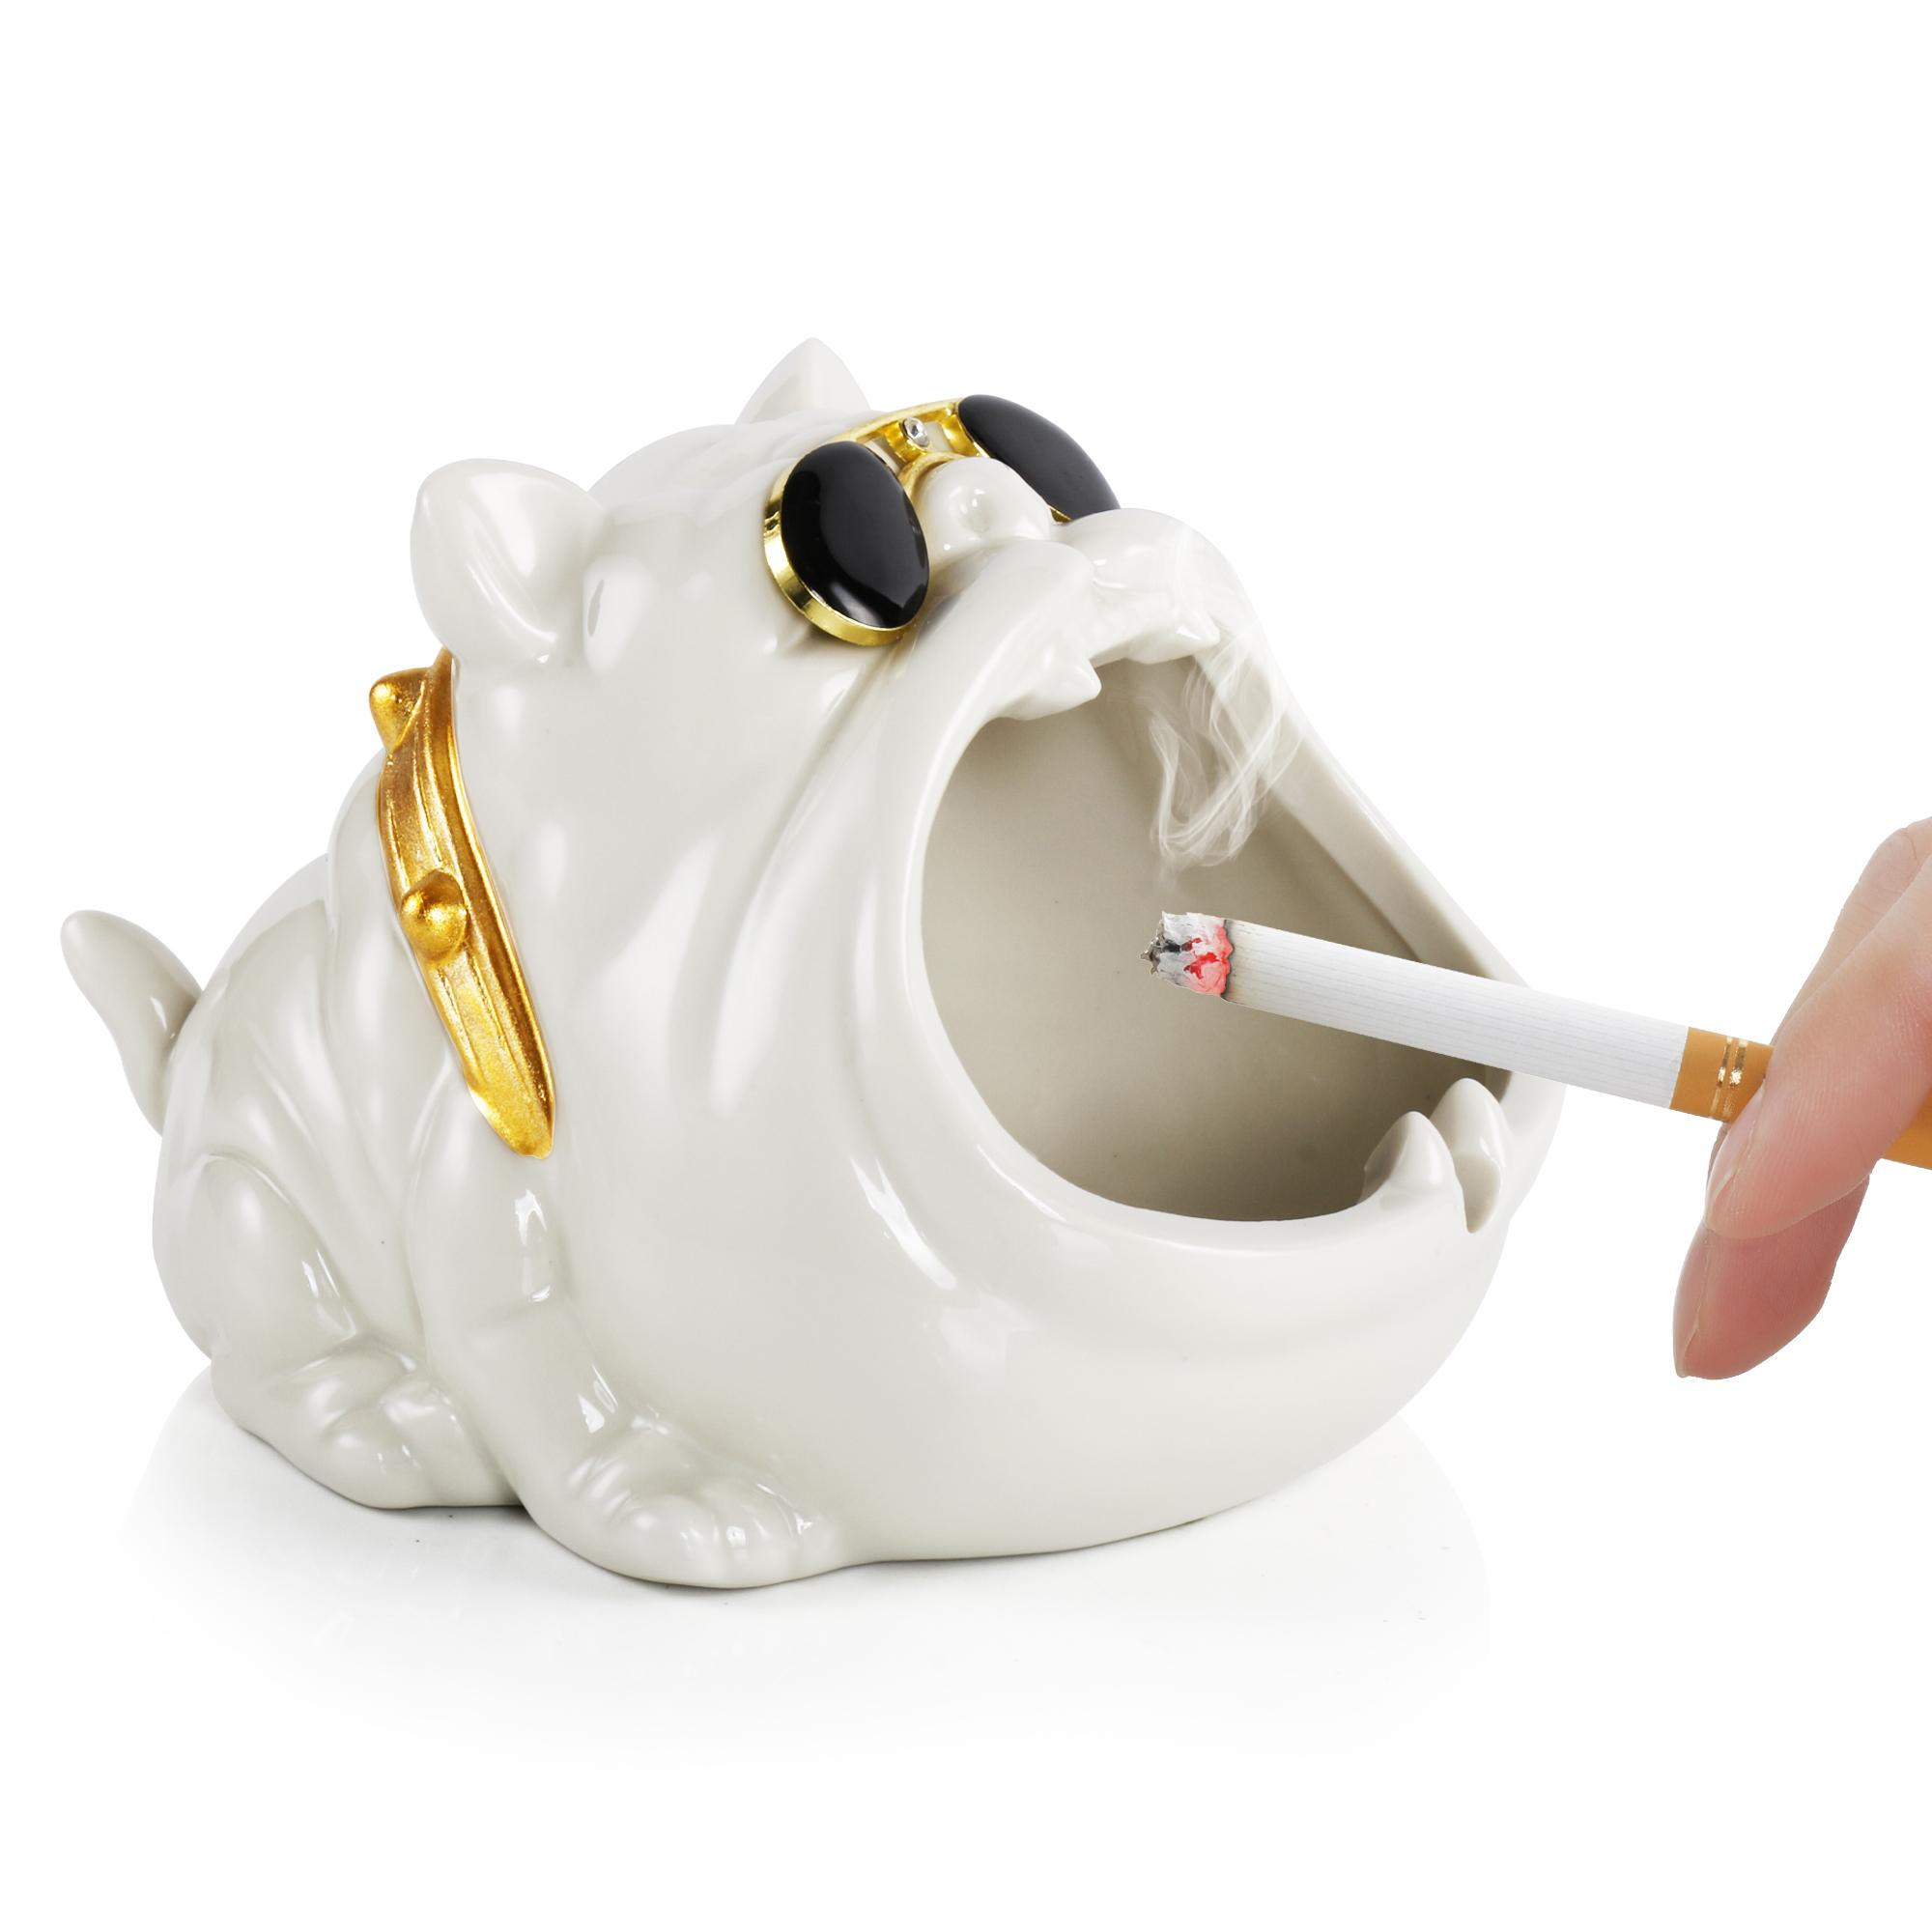 Reanice Unito de tabaco Cenicero fresco Cerámica Cerámica de ceniza Barra de ceniza Decoración para el hogar Cigarettes al aire libre Novedad Cenicero Cenicero blanco Bully Dog Moda